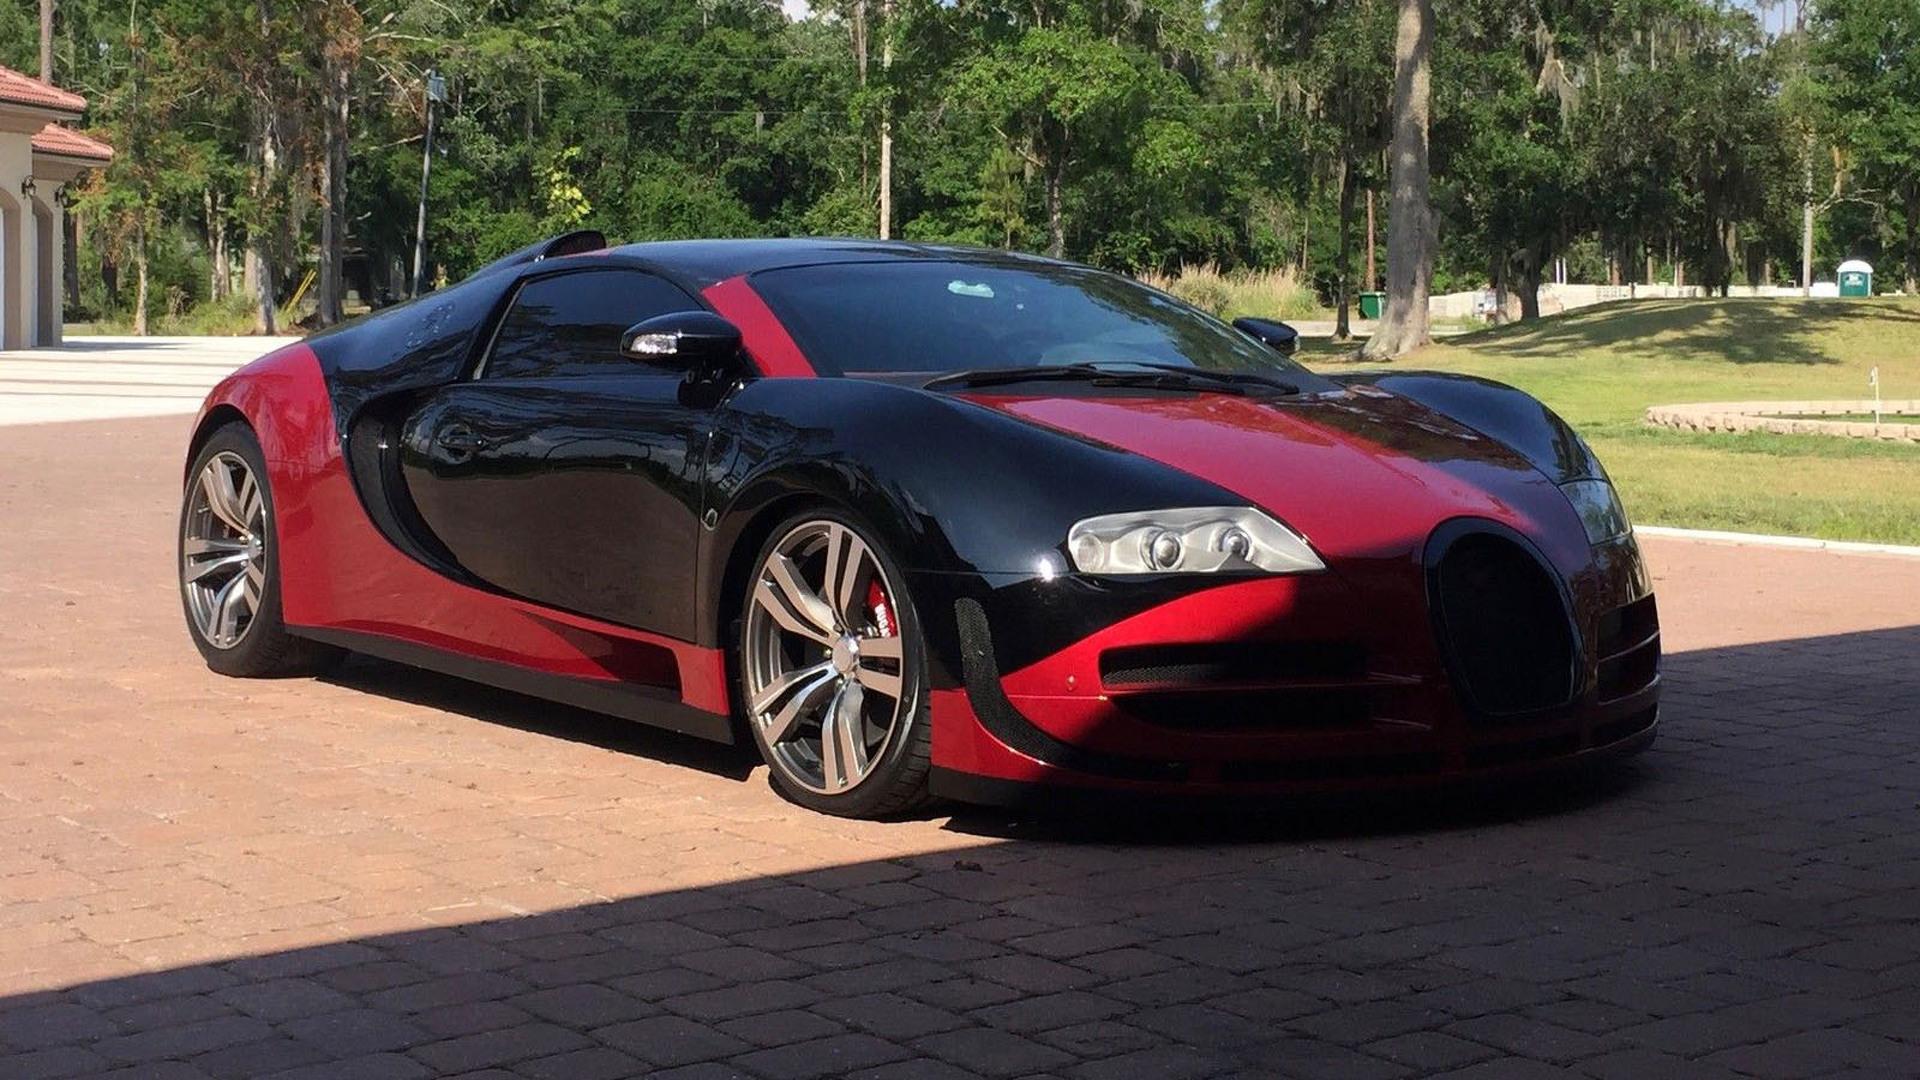 Bugatti veyron replica body kit for sale